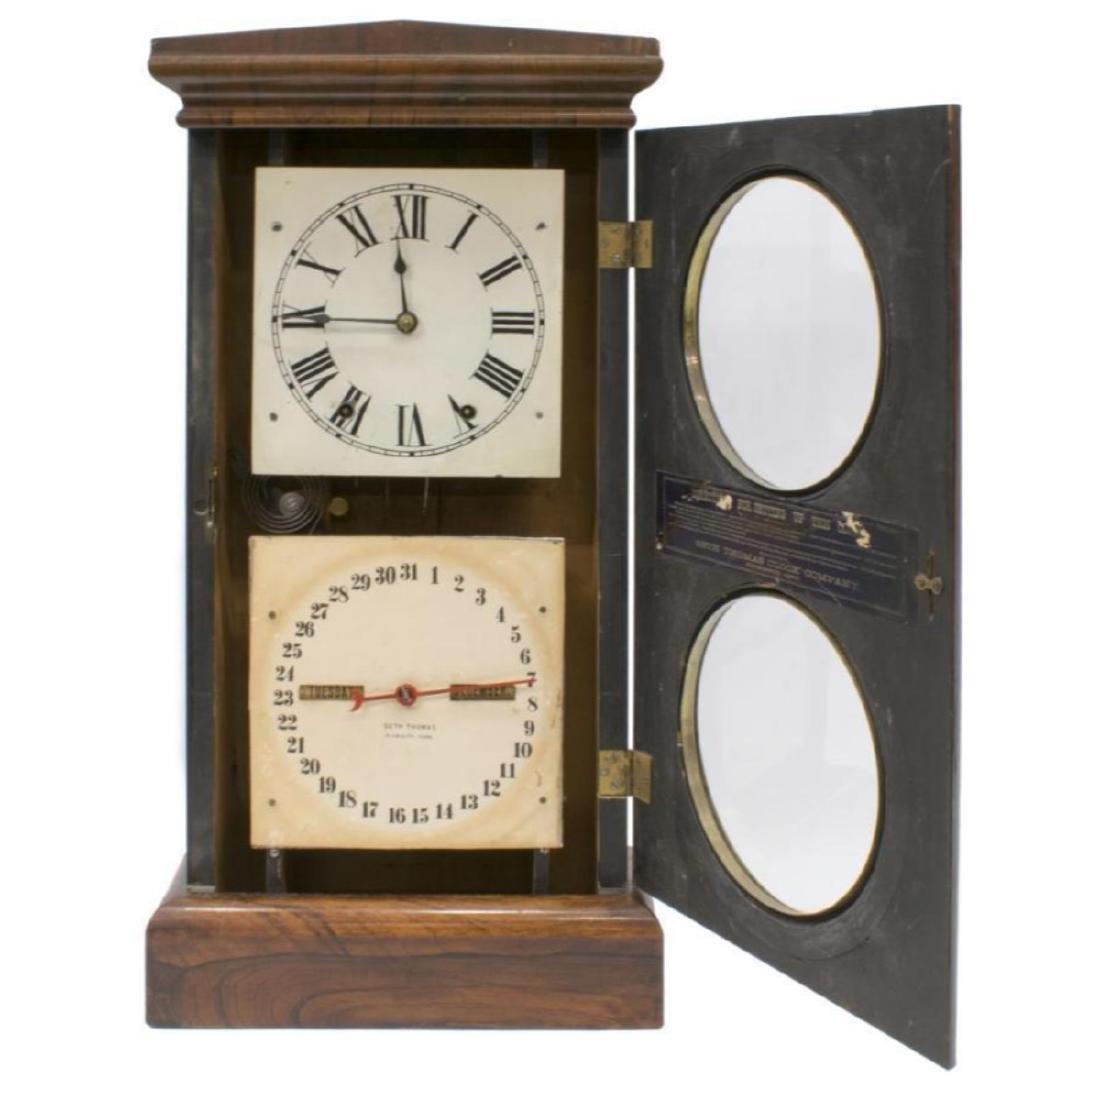 Seth Thomas Rosewood Cased Calendar Clock - 2